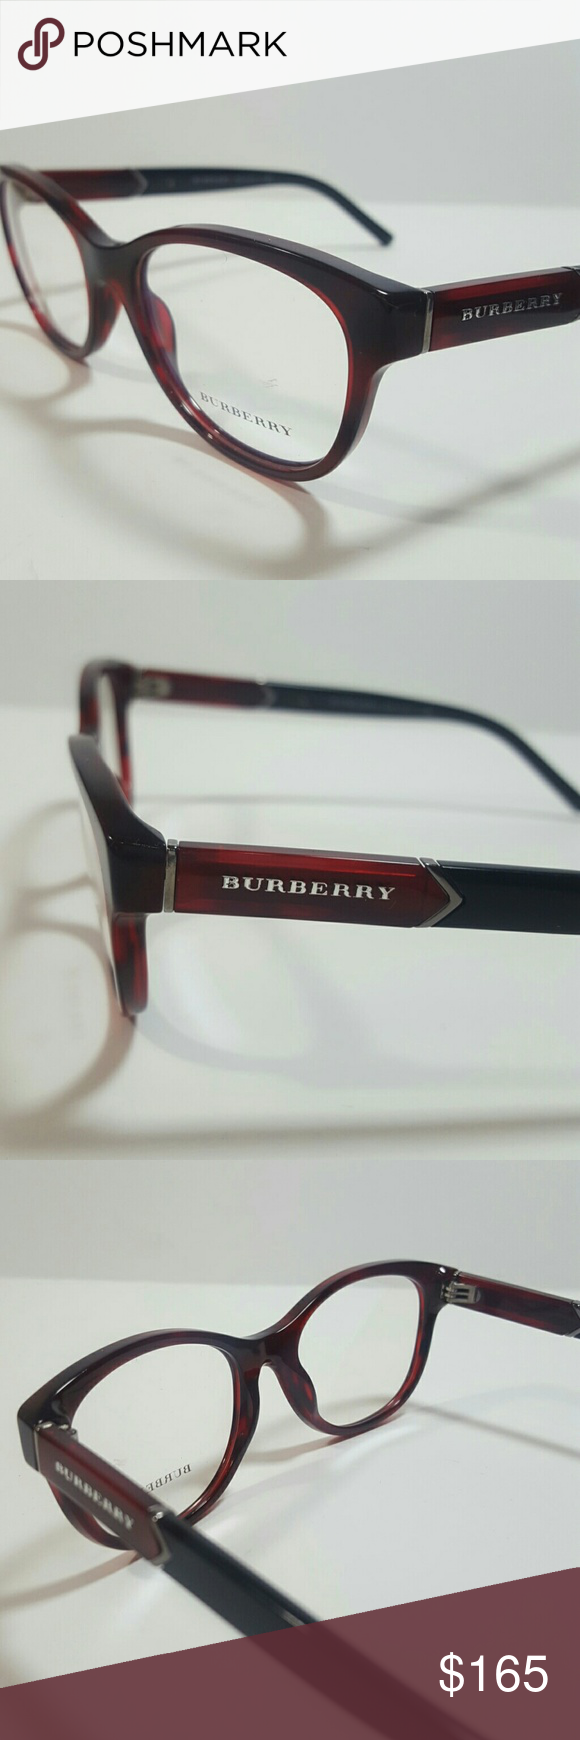 Burberry Eyeglasses Authentic Burberry Eyeglasses  Size 52-18-140  Includes original case Burberry Accessories Glasses